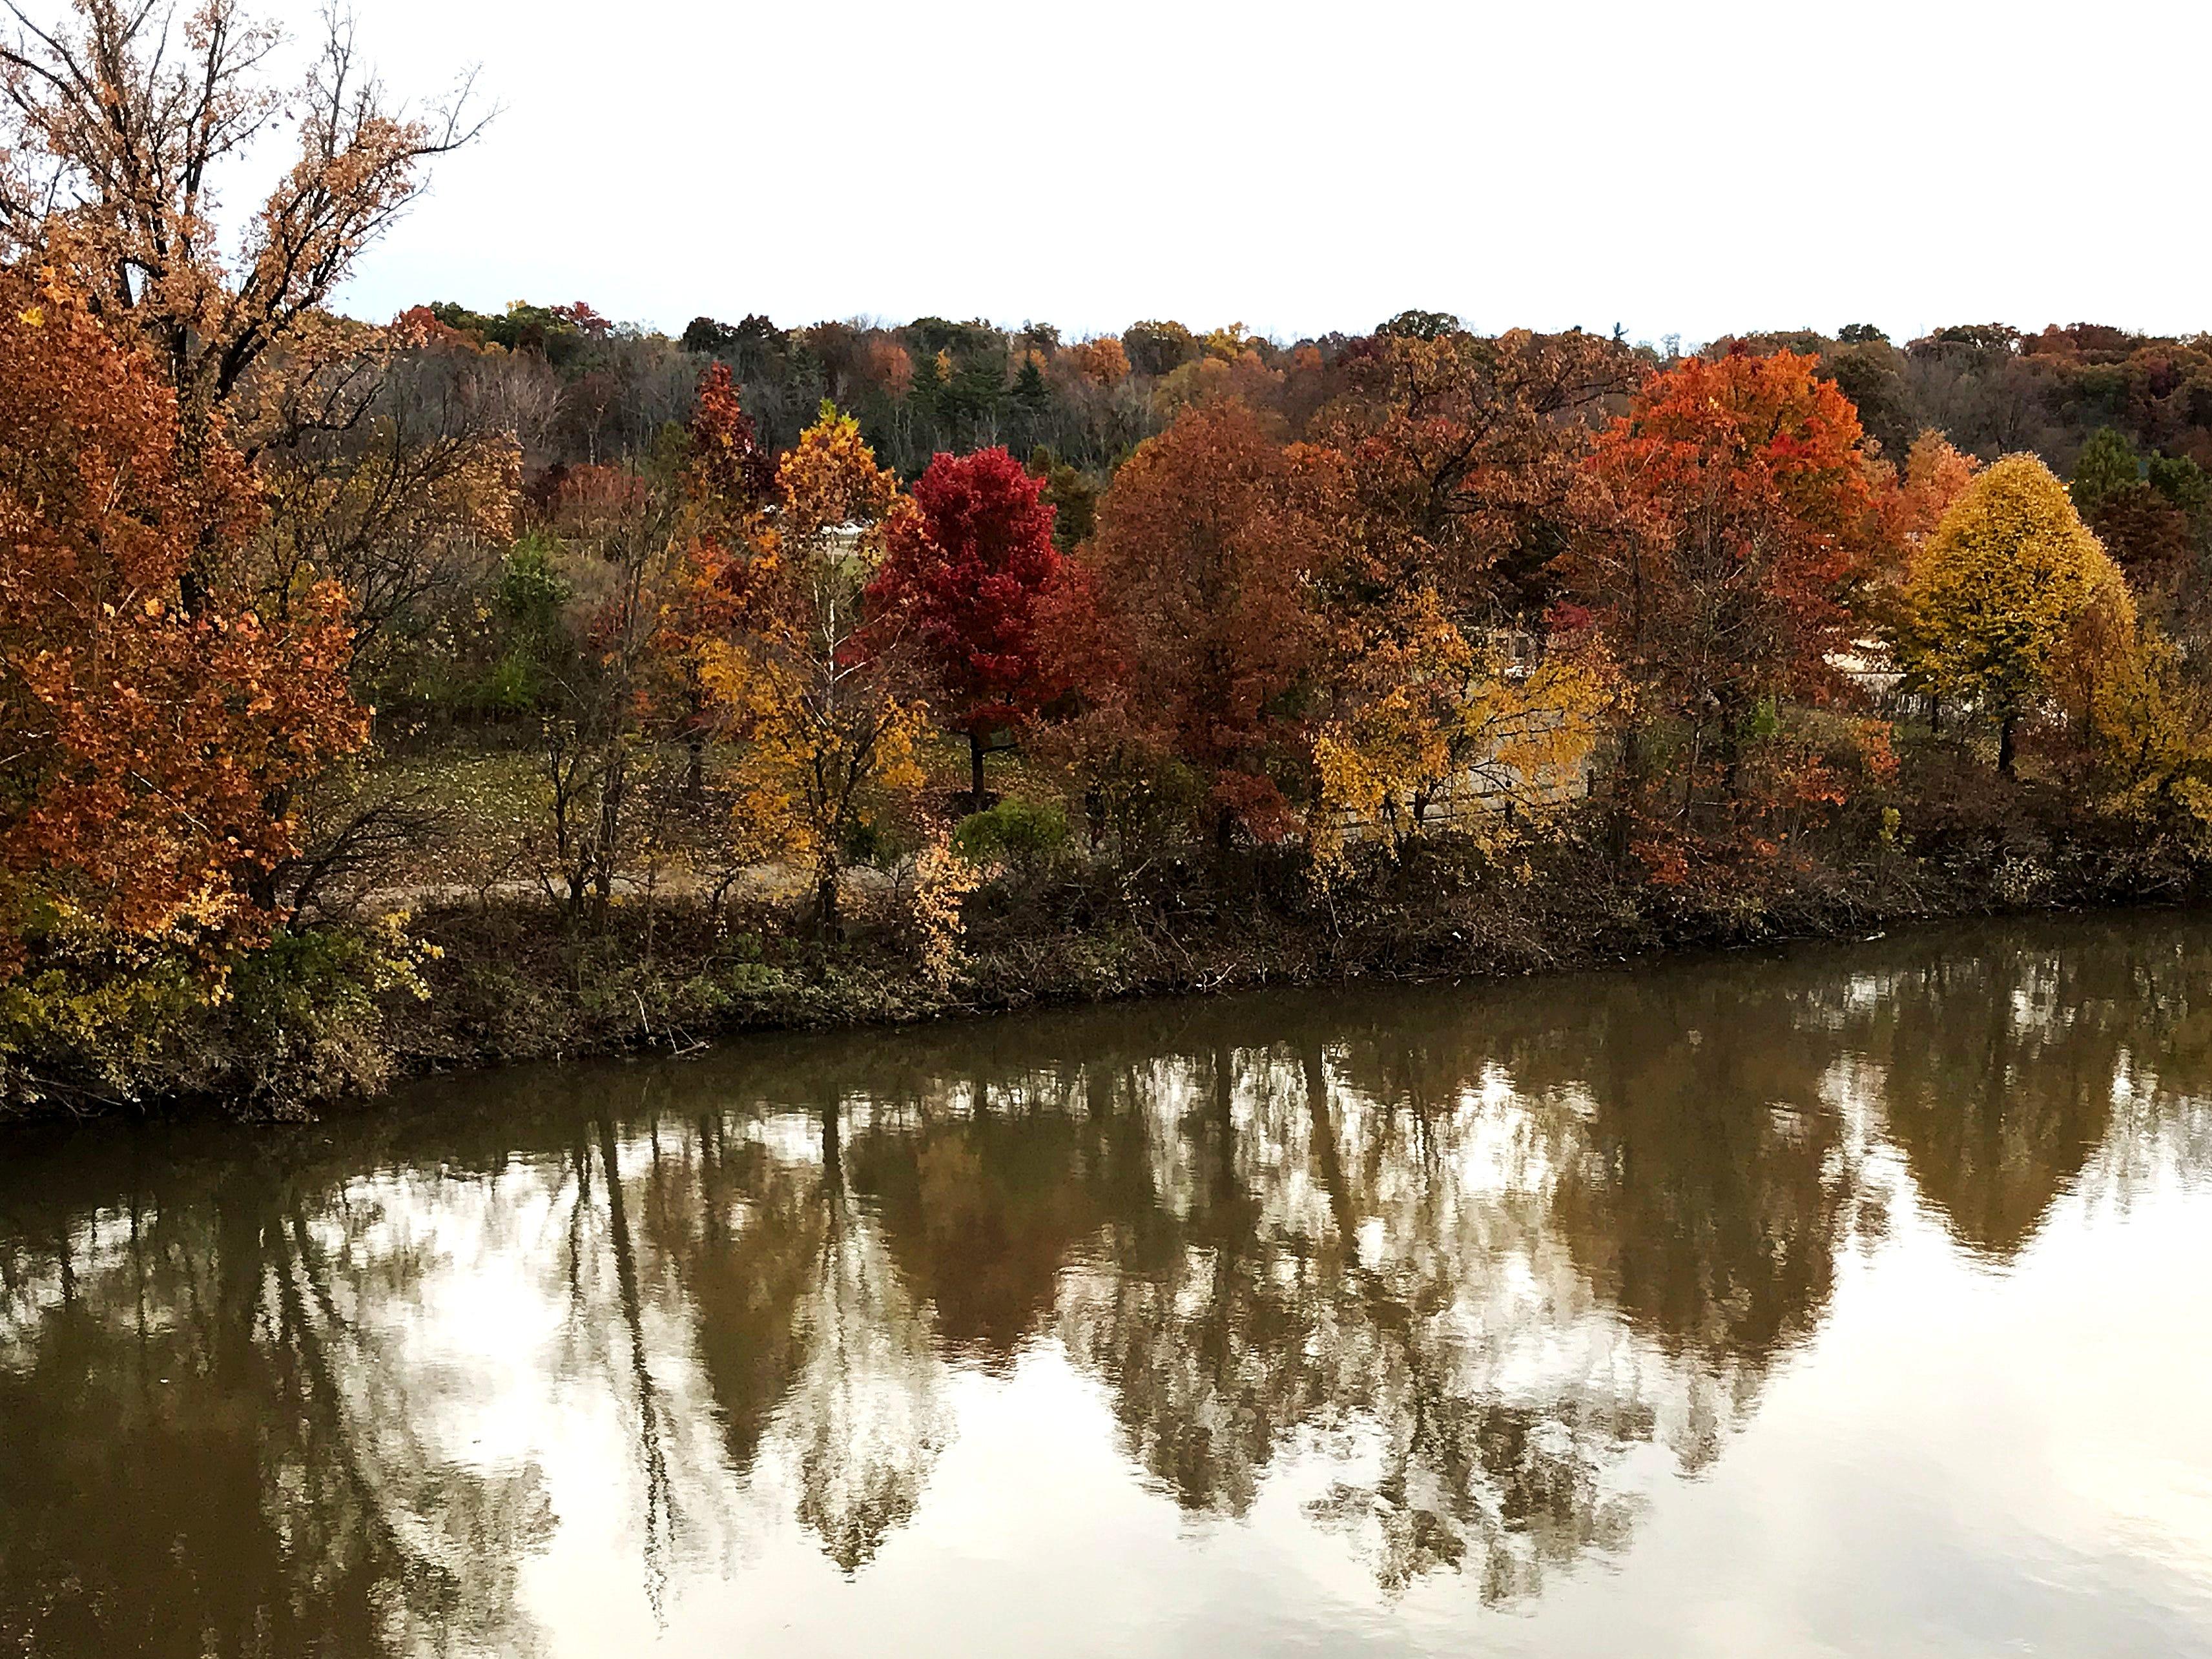 Fall colors reflect on Winton Lake at Winton Woods Park Sunday, November 4, 2018.